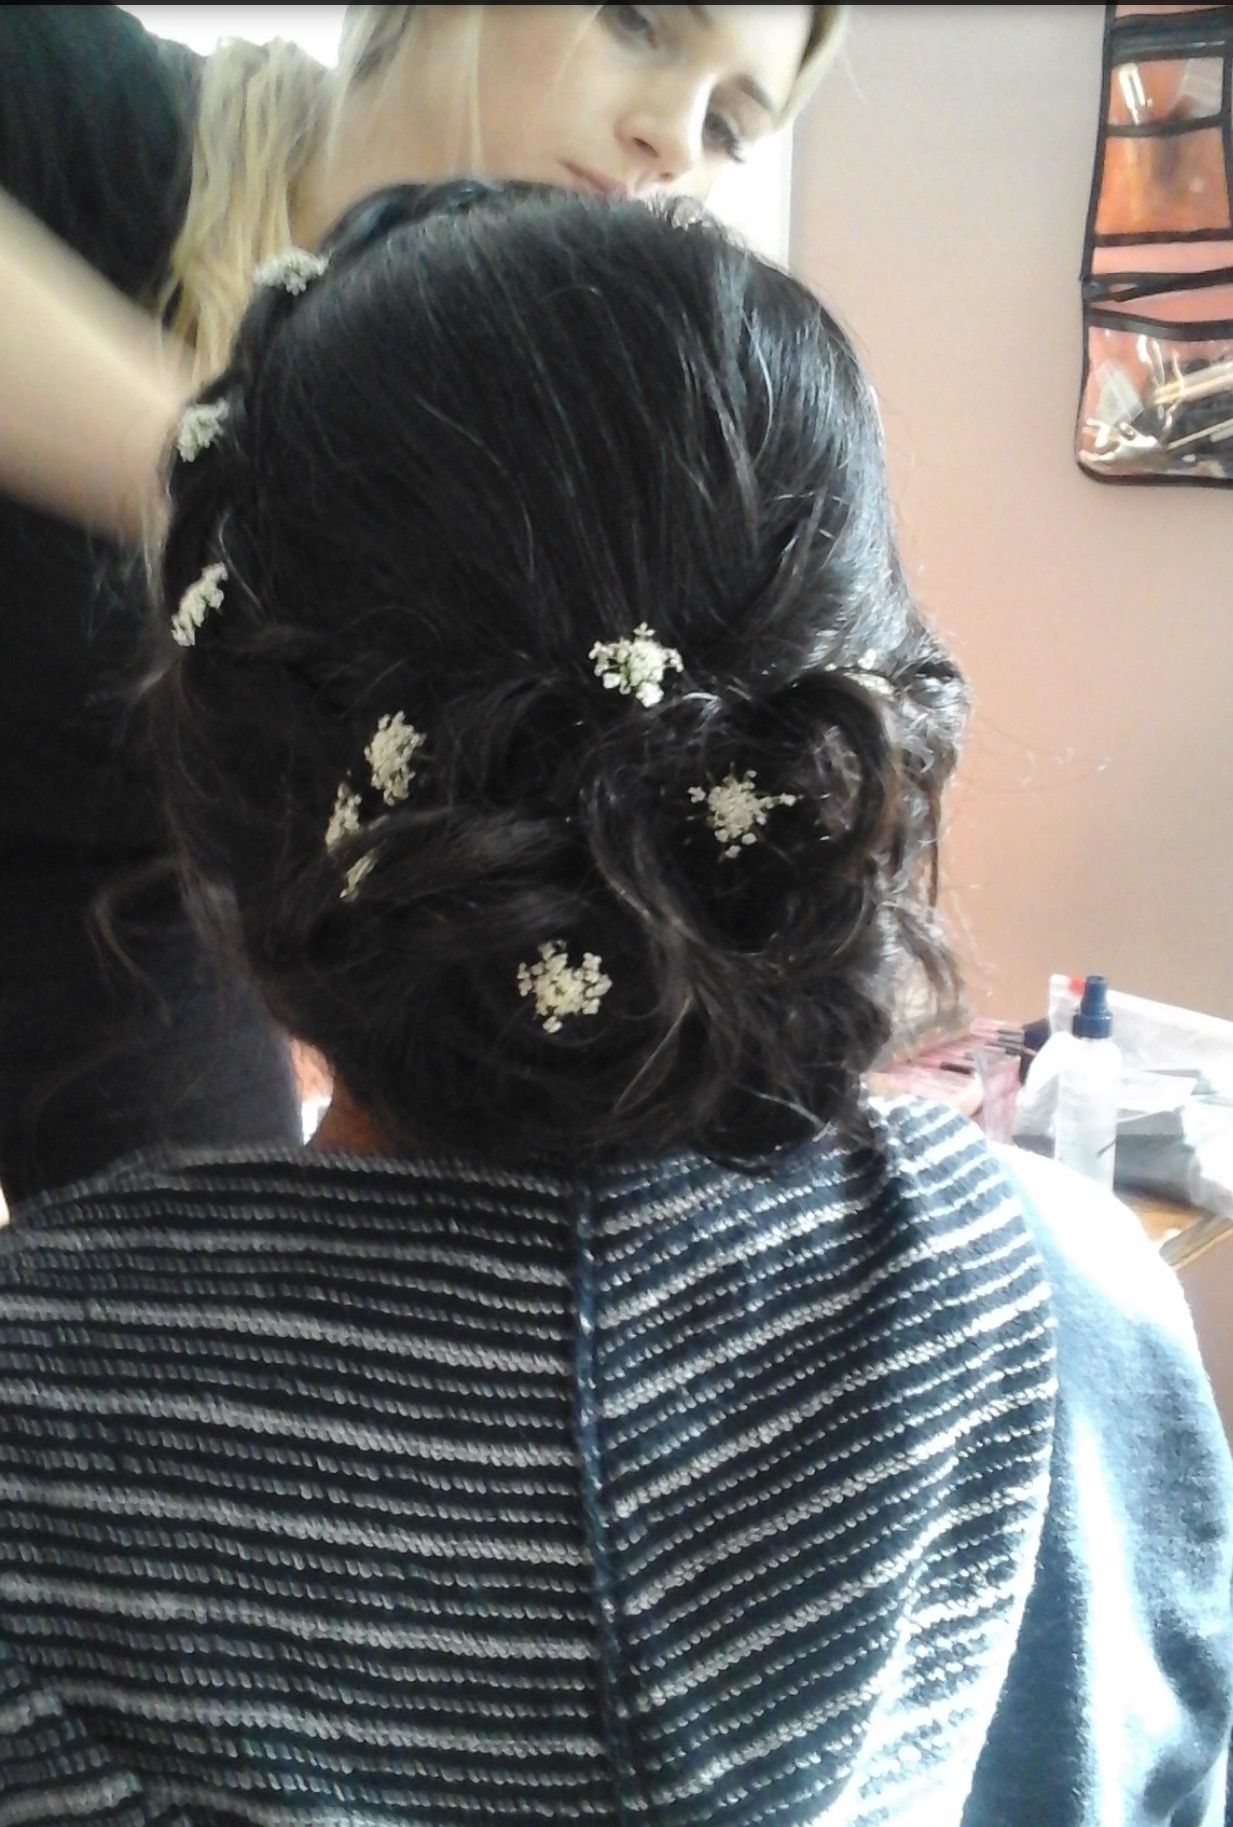 Danielle hair makeup saint albans vermont upstate ny